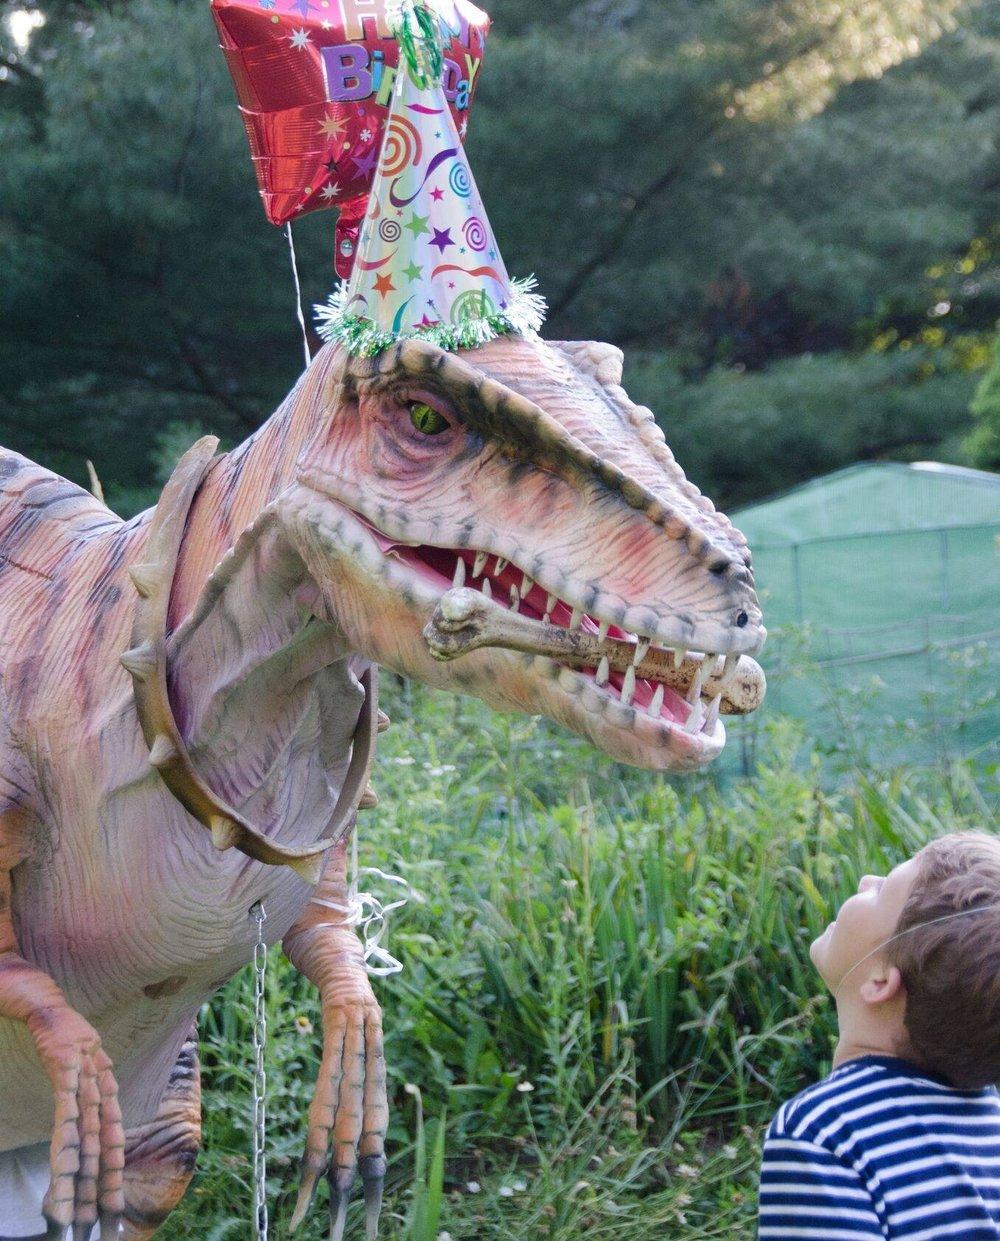 Rent a dinosaur Chicago